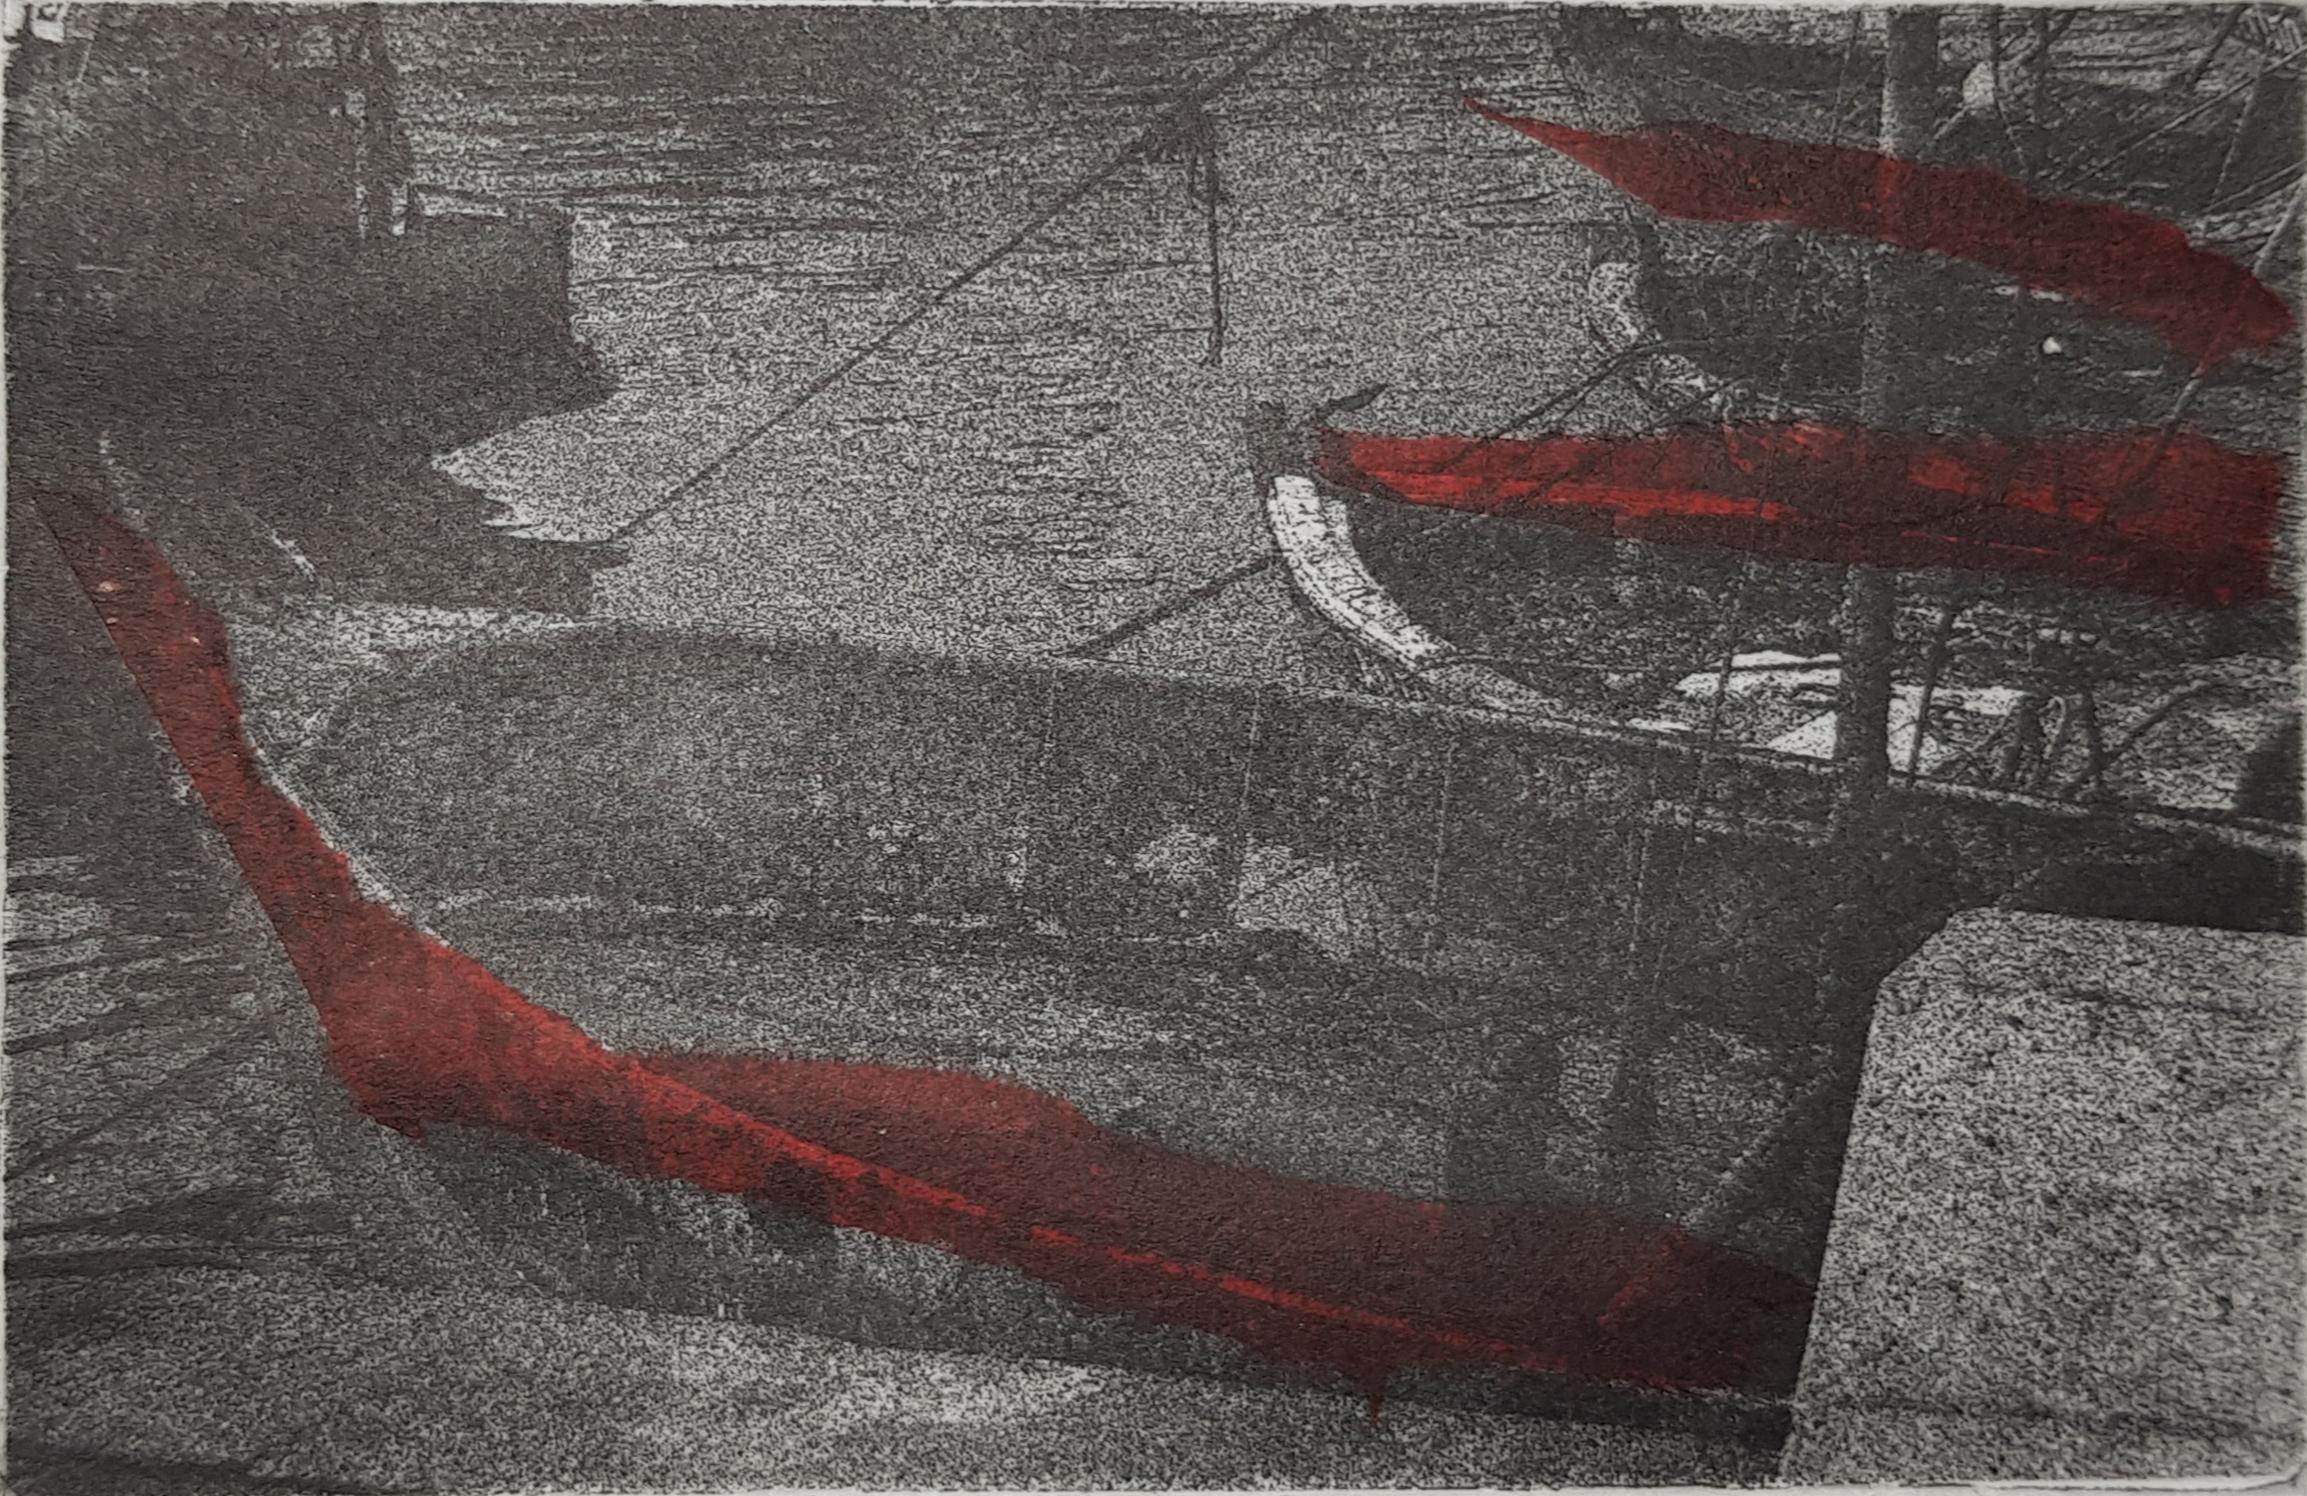 Adriana Furstner | Serie fotograbado. Juntos 3. Chine colle. 14,7 x 9,7 cm. 2018